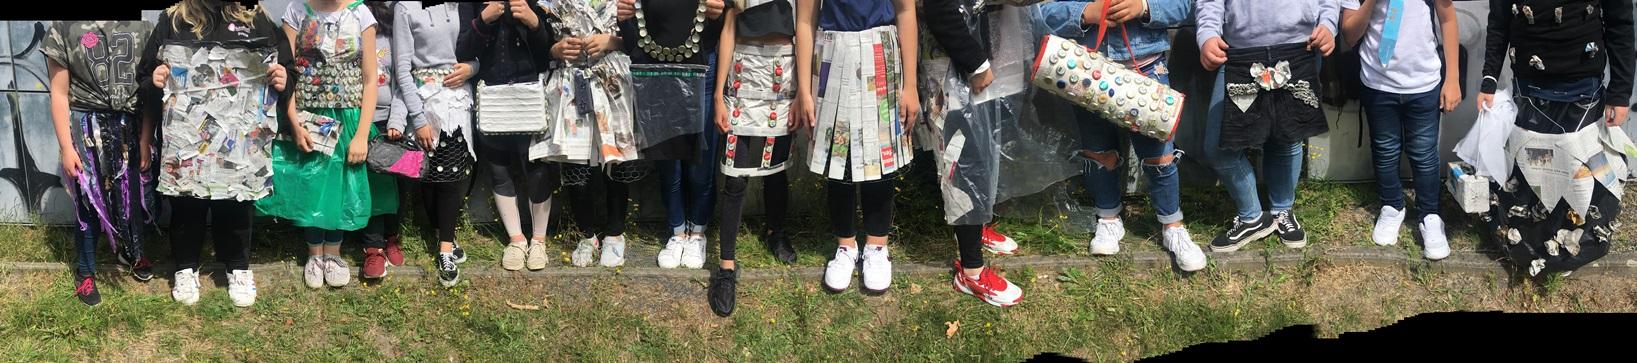 Projekttage 2019 – Mode aus Müll